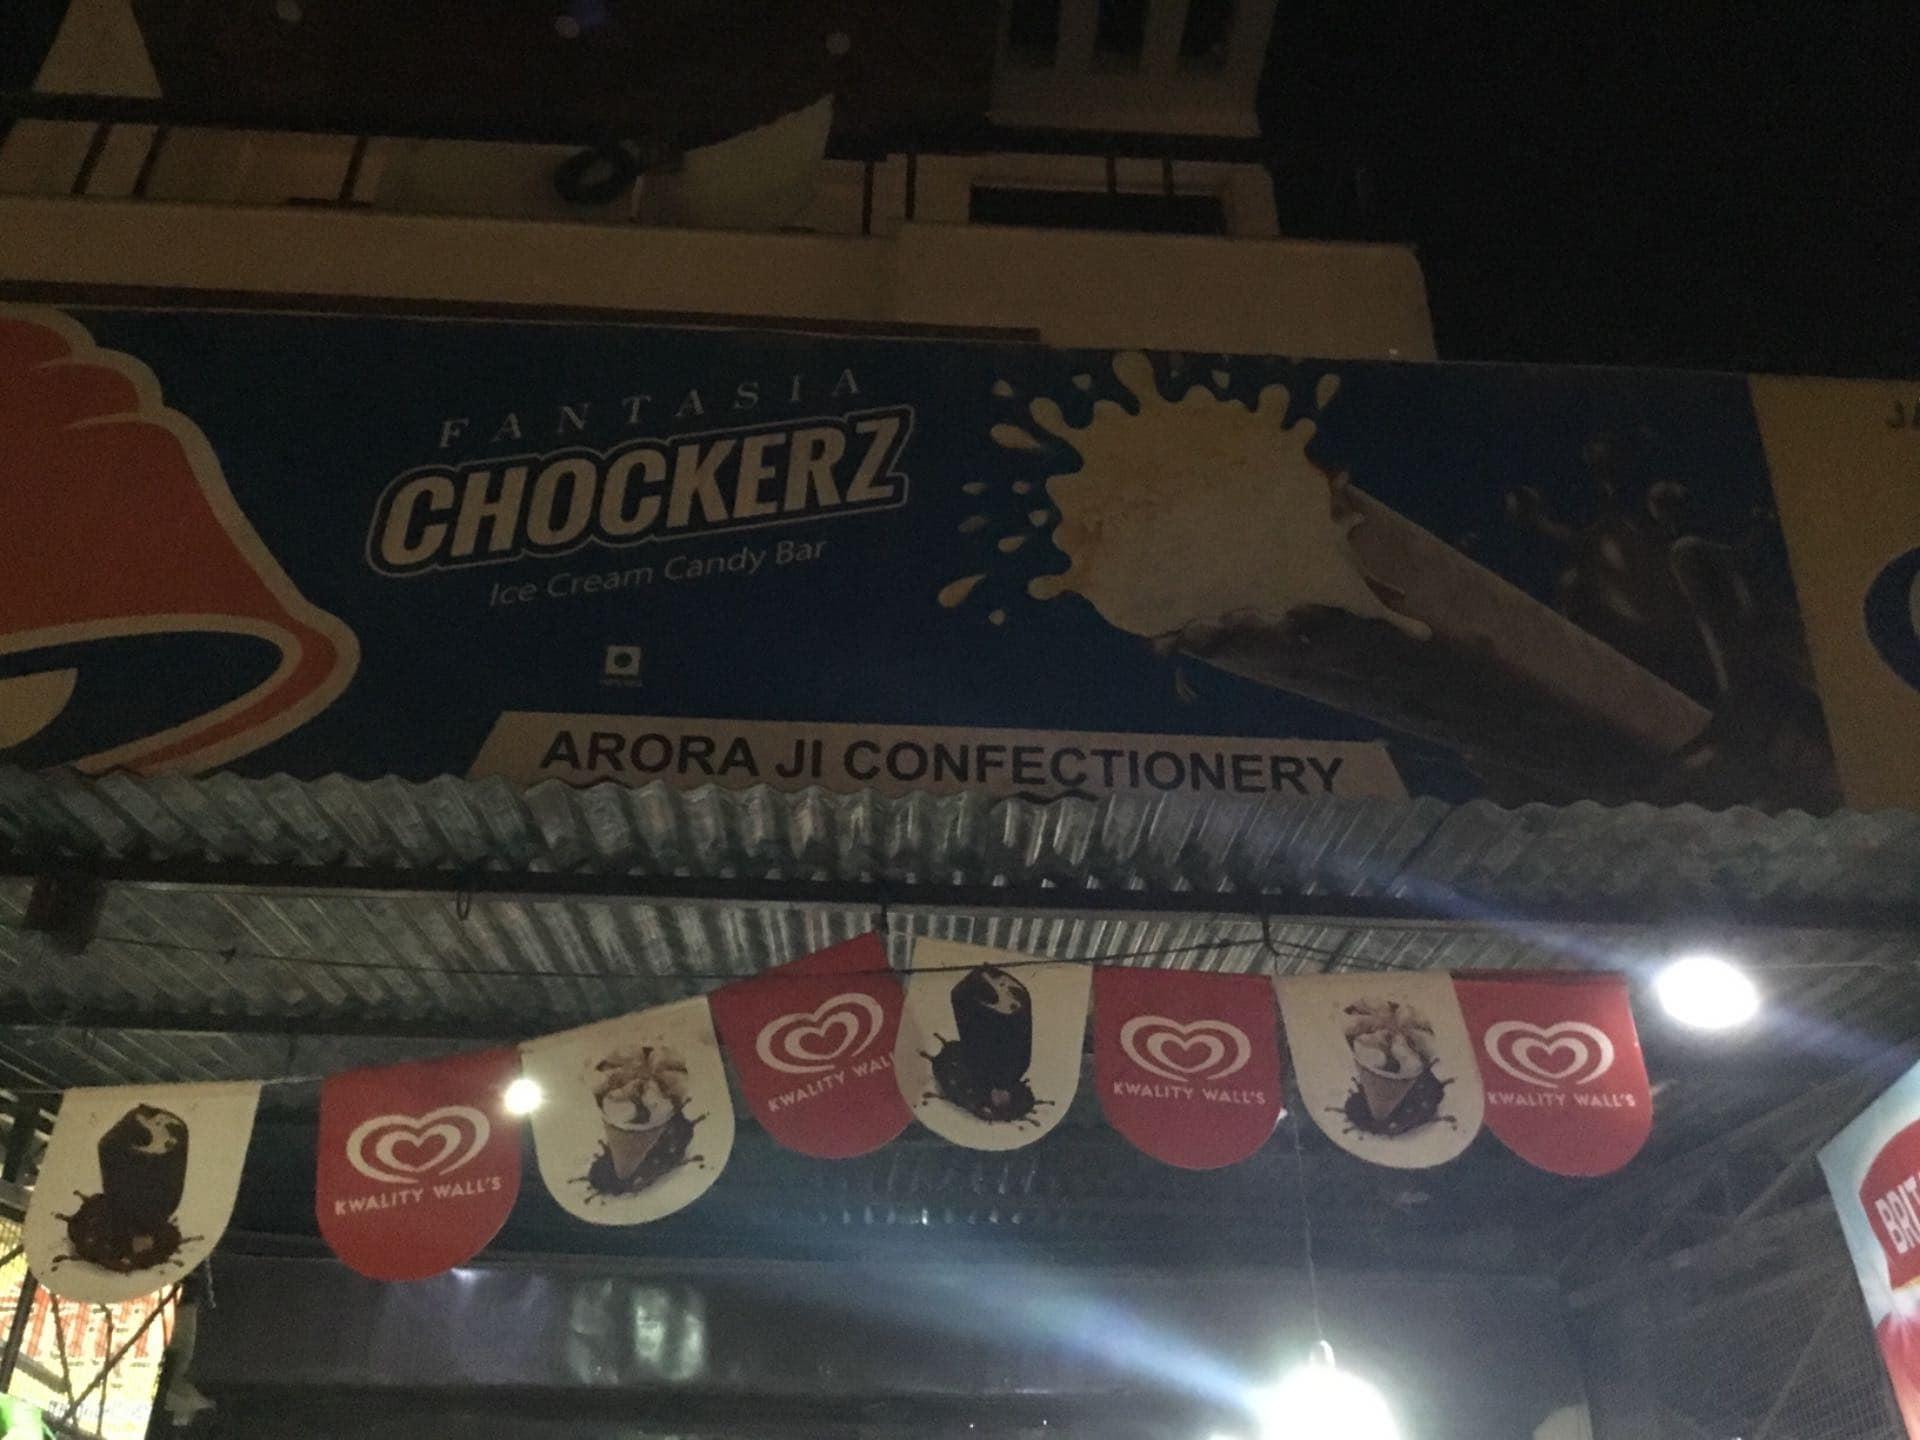 Top 50 Cake Shops in Gorai - Best Pastry Shops Gorai Aligarh